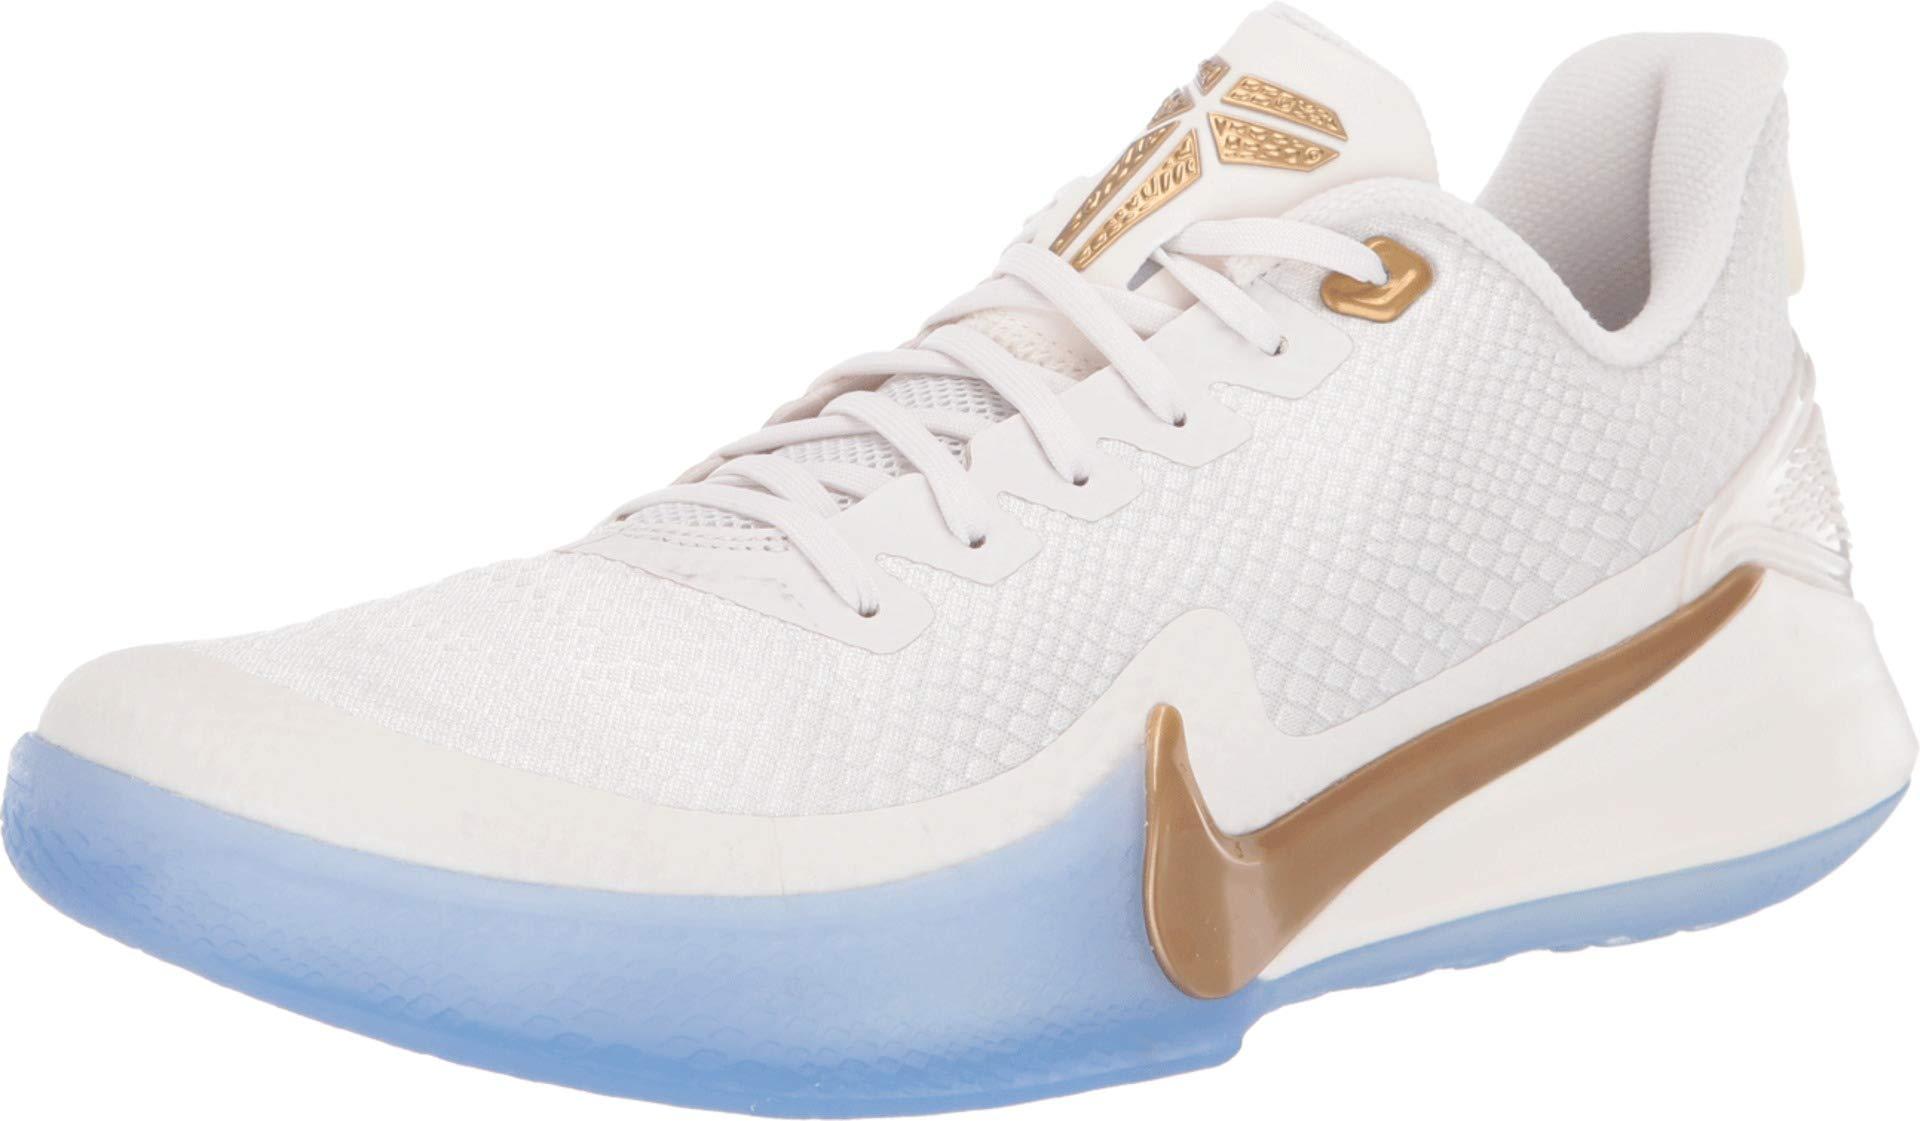 Nike Mamba Focus [AJ5899-004] Men Basketball Shoes Kobe Bryant Phantom/Gold/US 10.5 by Nike